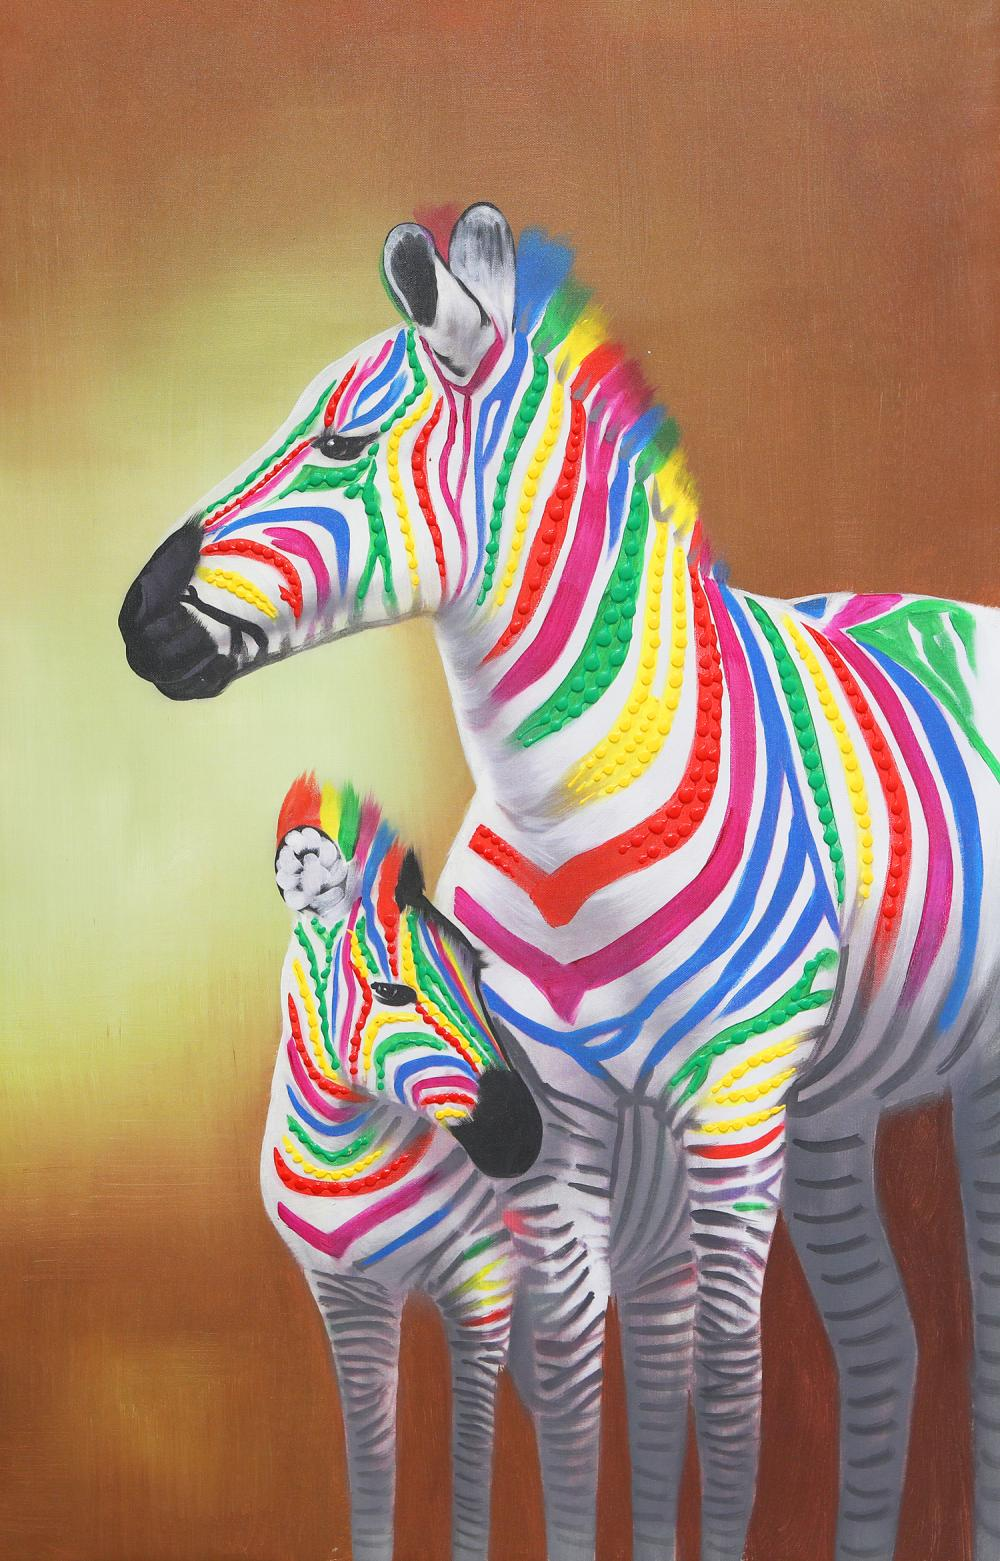 Colourful Zebra on Canvas